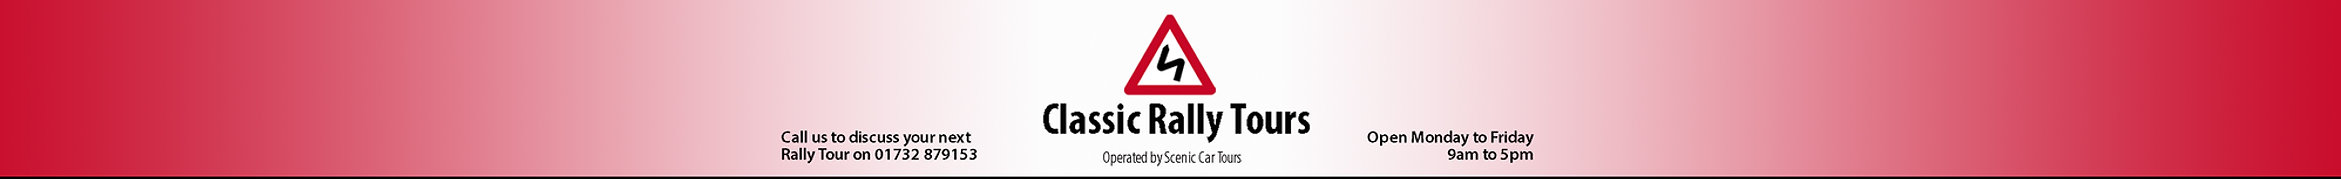 Classic Rally tours web header V3.jpg